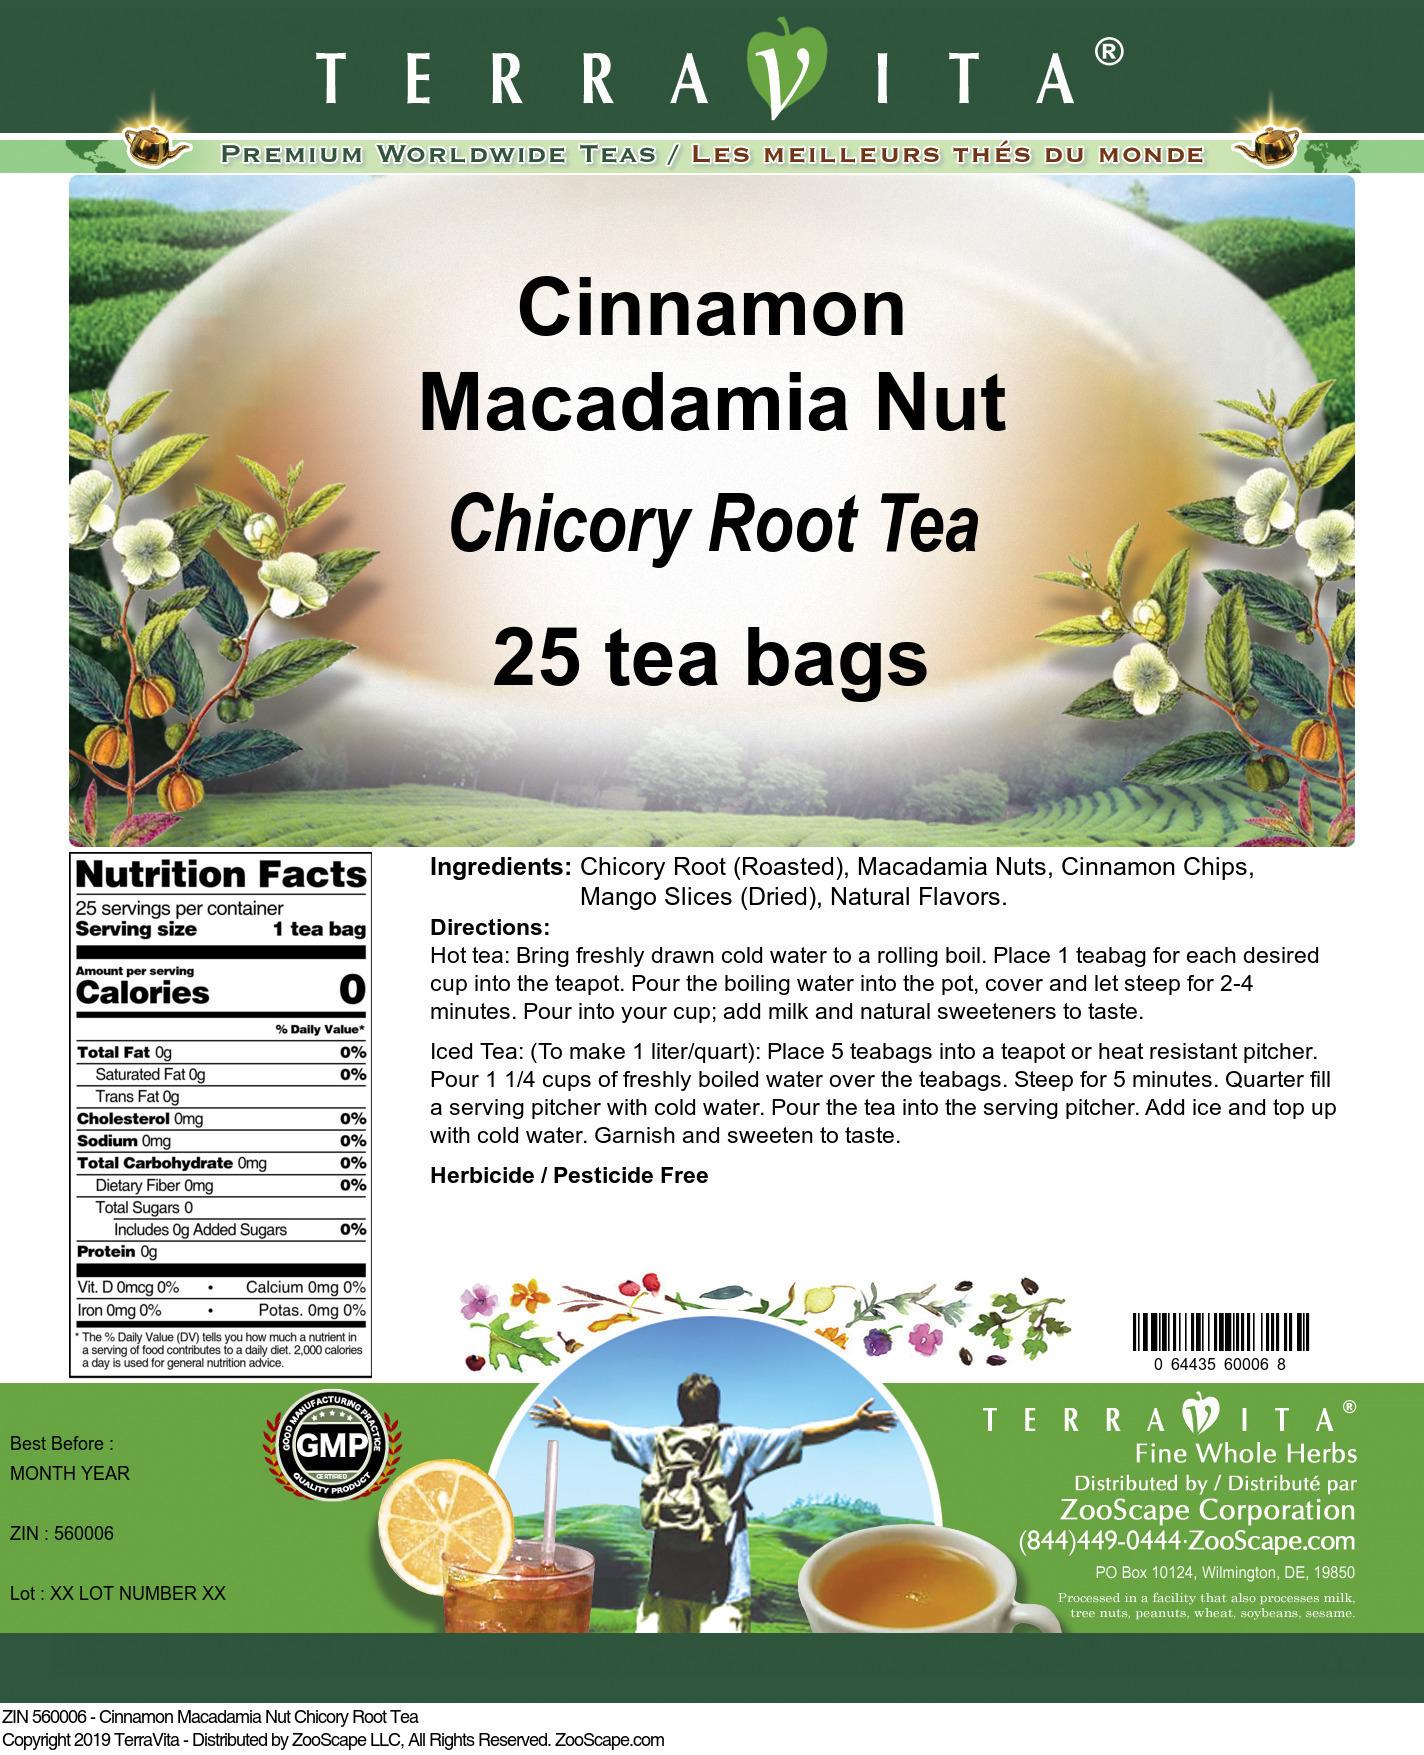 Cinnamon Macadamia Nut Chicory Root